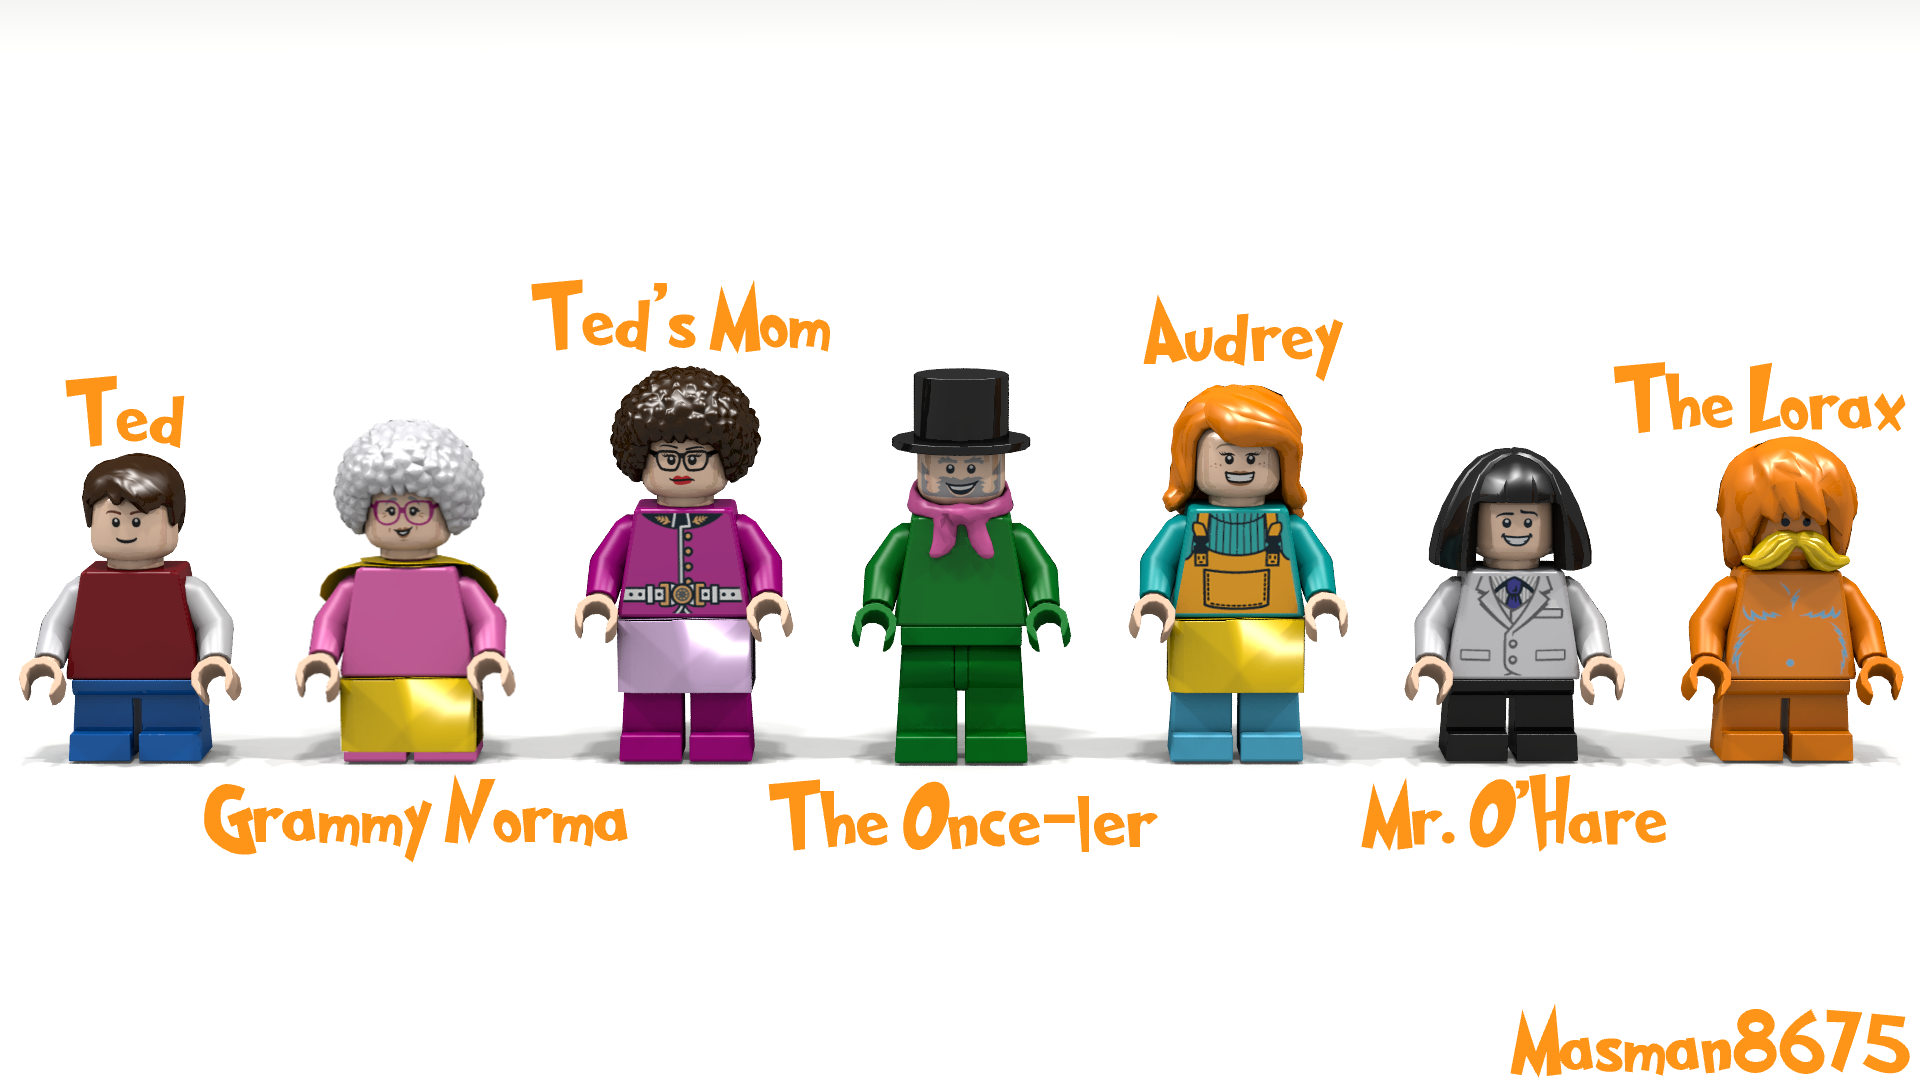 Lego Ideas The Lorax